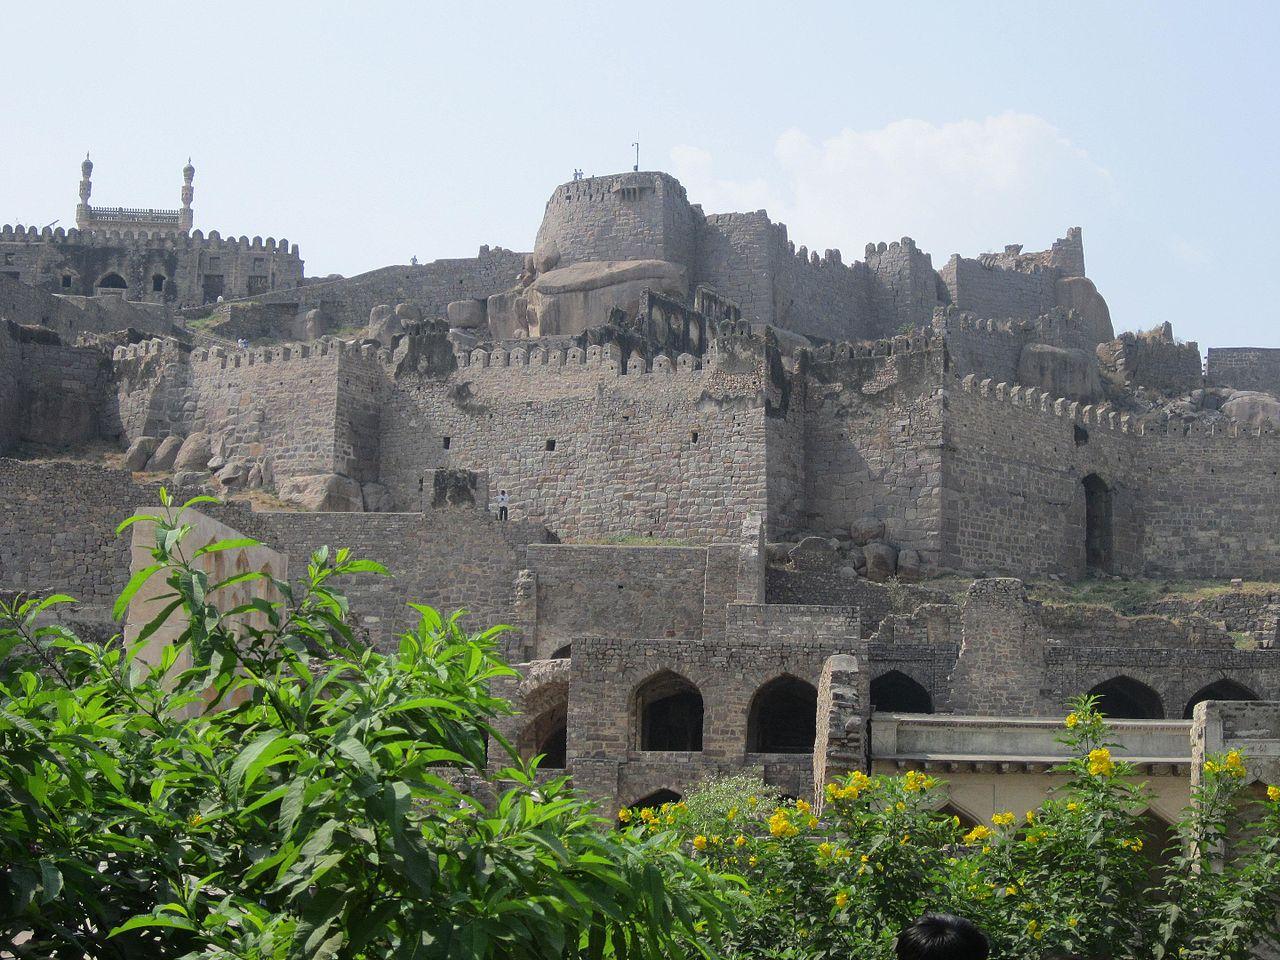 Best Things To Do At The Osman Sagar Lake-Explore The Historical Golconda Fort